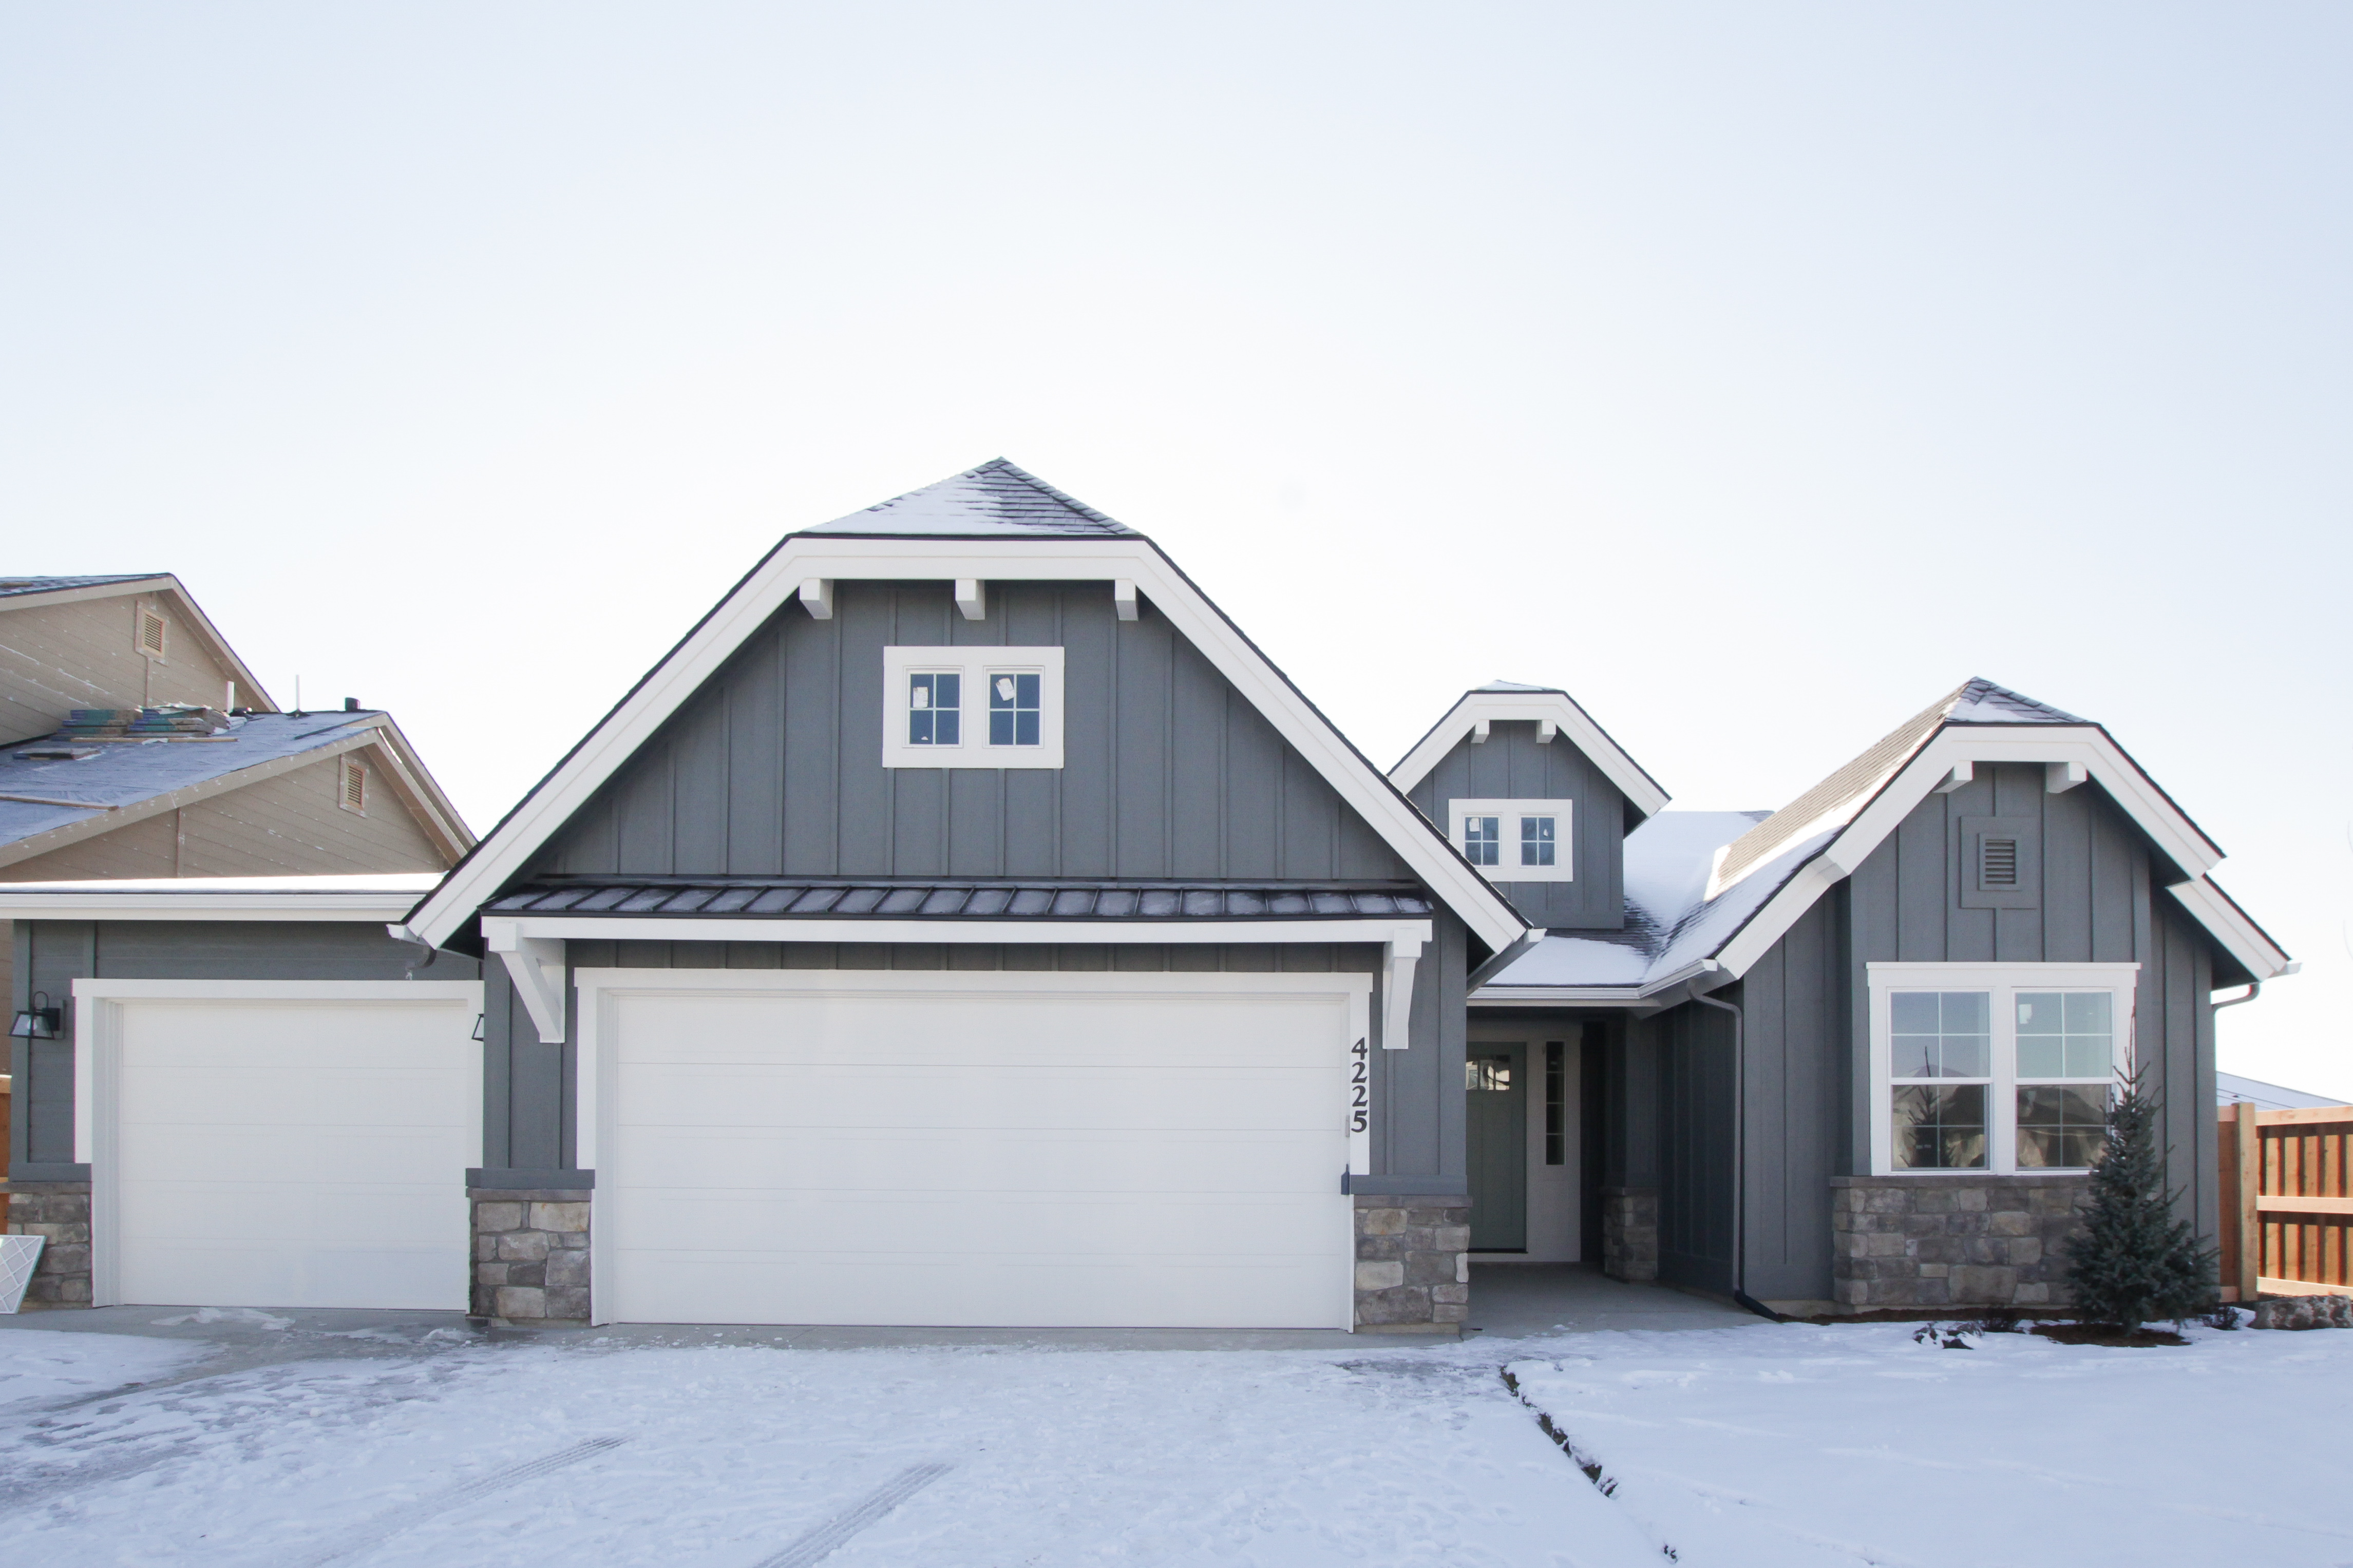 4225 W. Sunny Cove St., Meridian, Idaho 83646